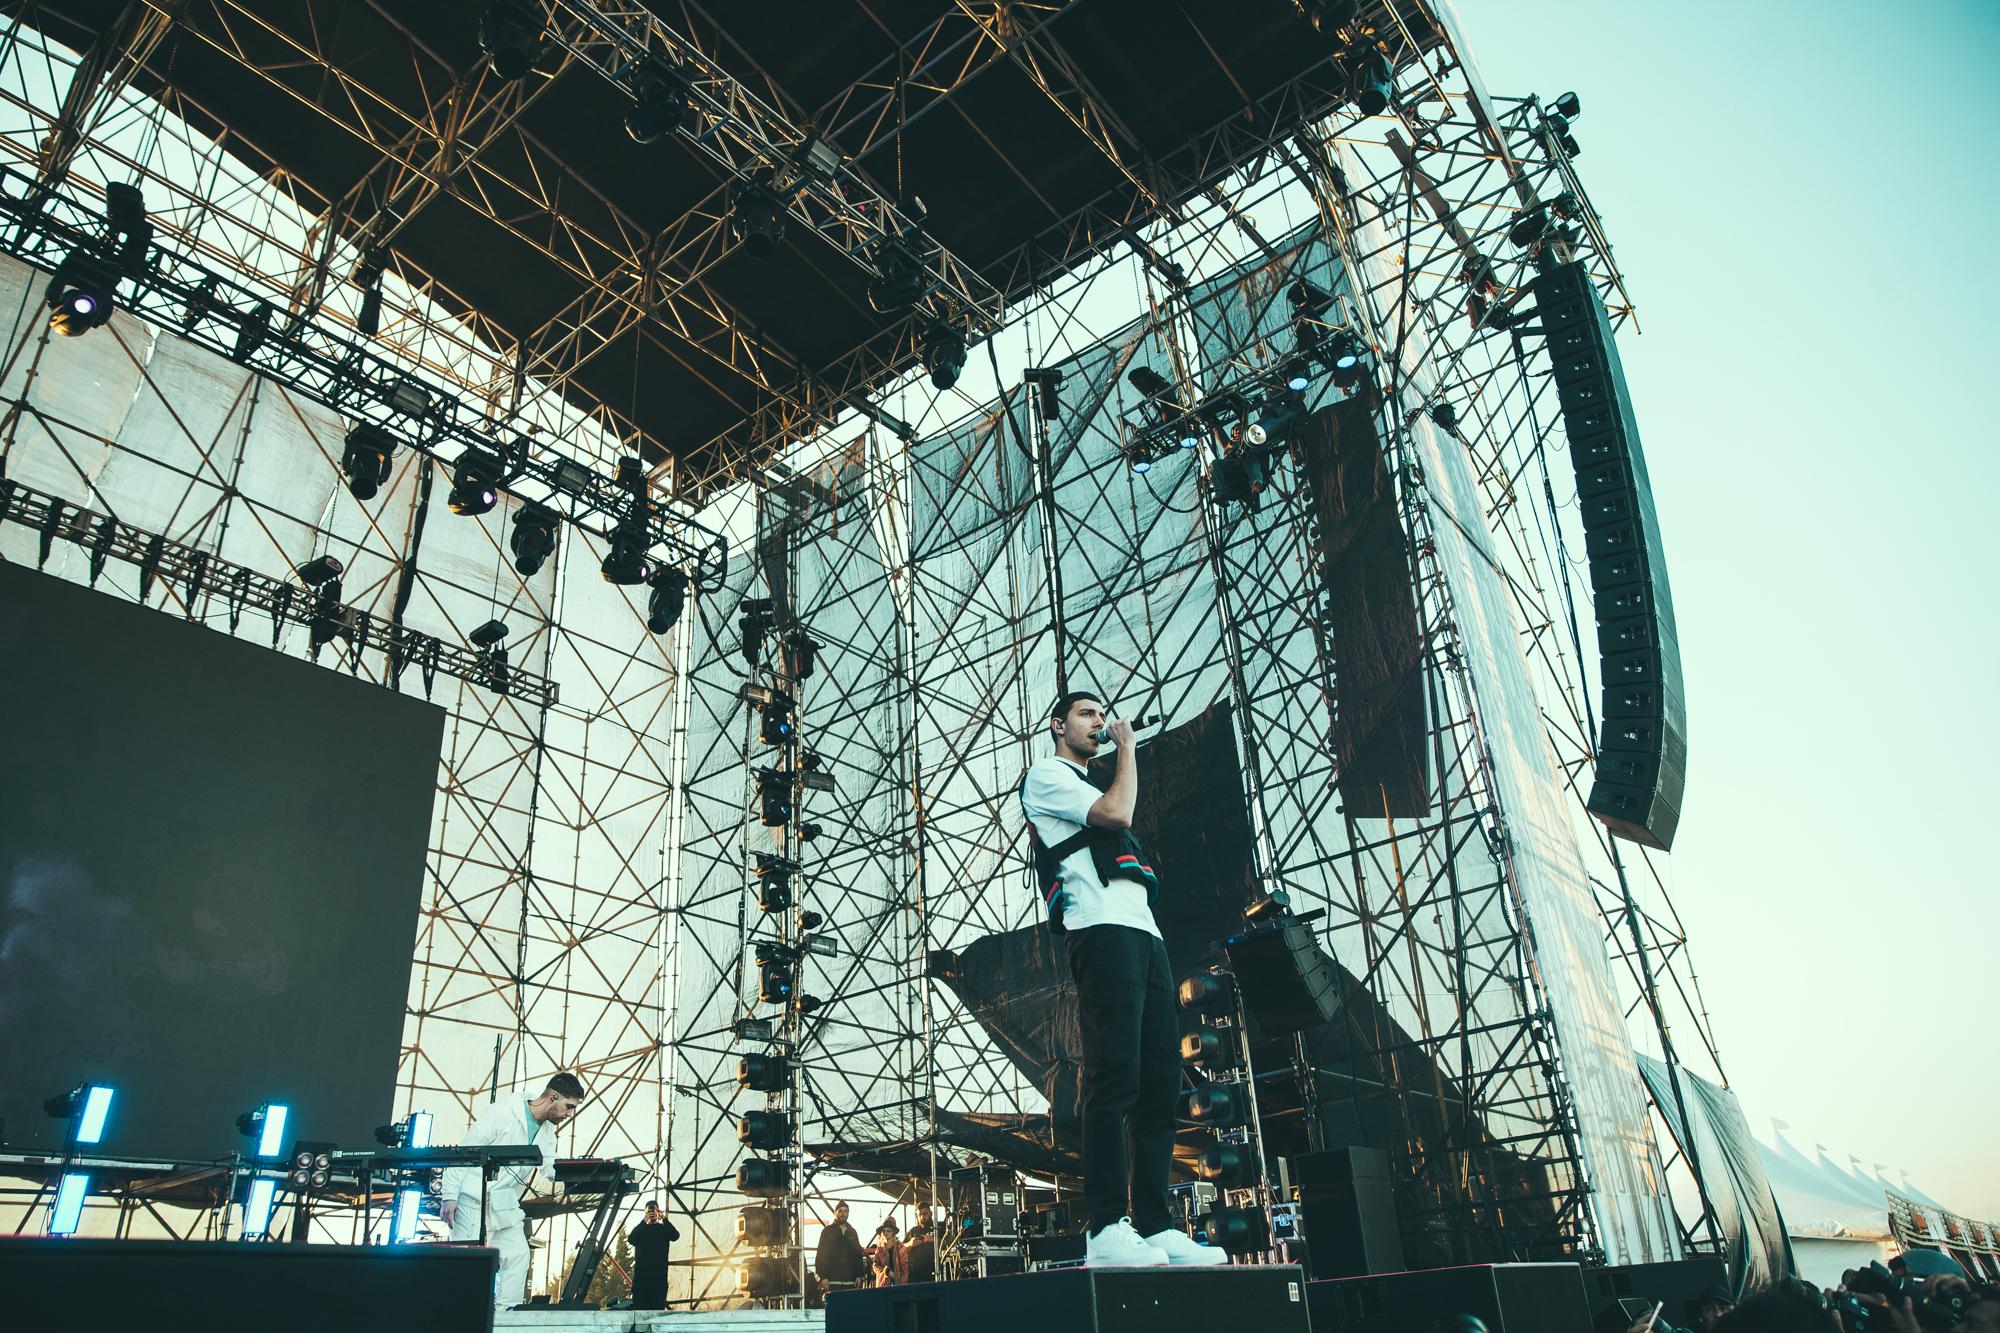 Majid Jordan-Festival Ceremonia-Mexico-Foro Pegaso-04.02.2017-Daniel Patlan_Desde 1989 (1 of 29).jpg